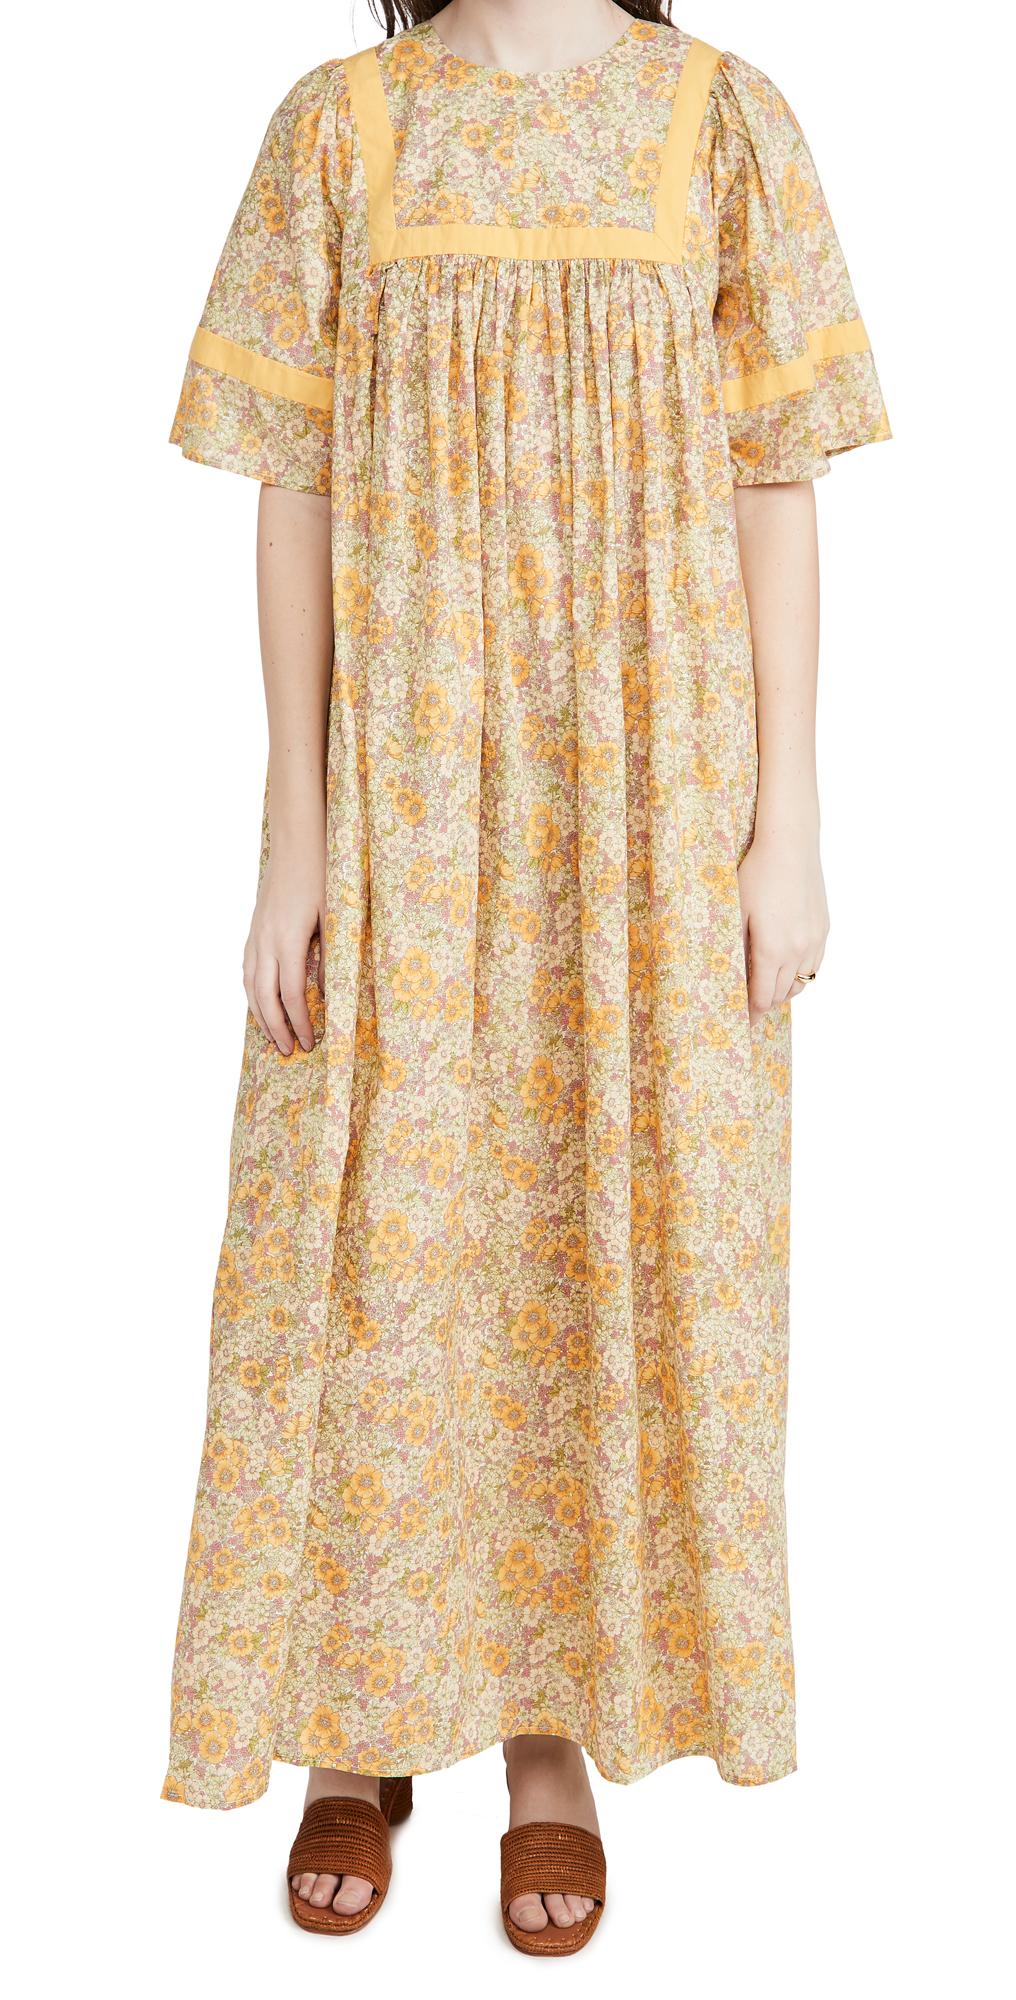 Meadows Heli Dress